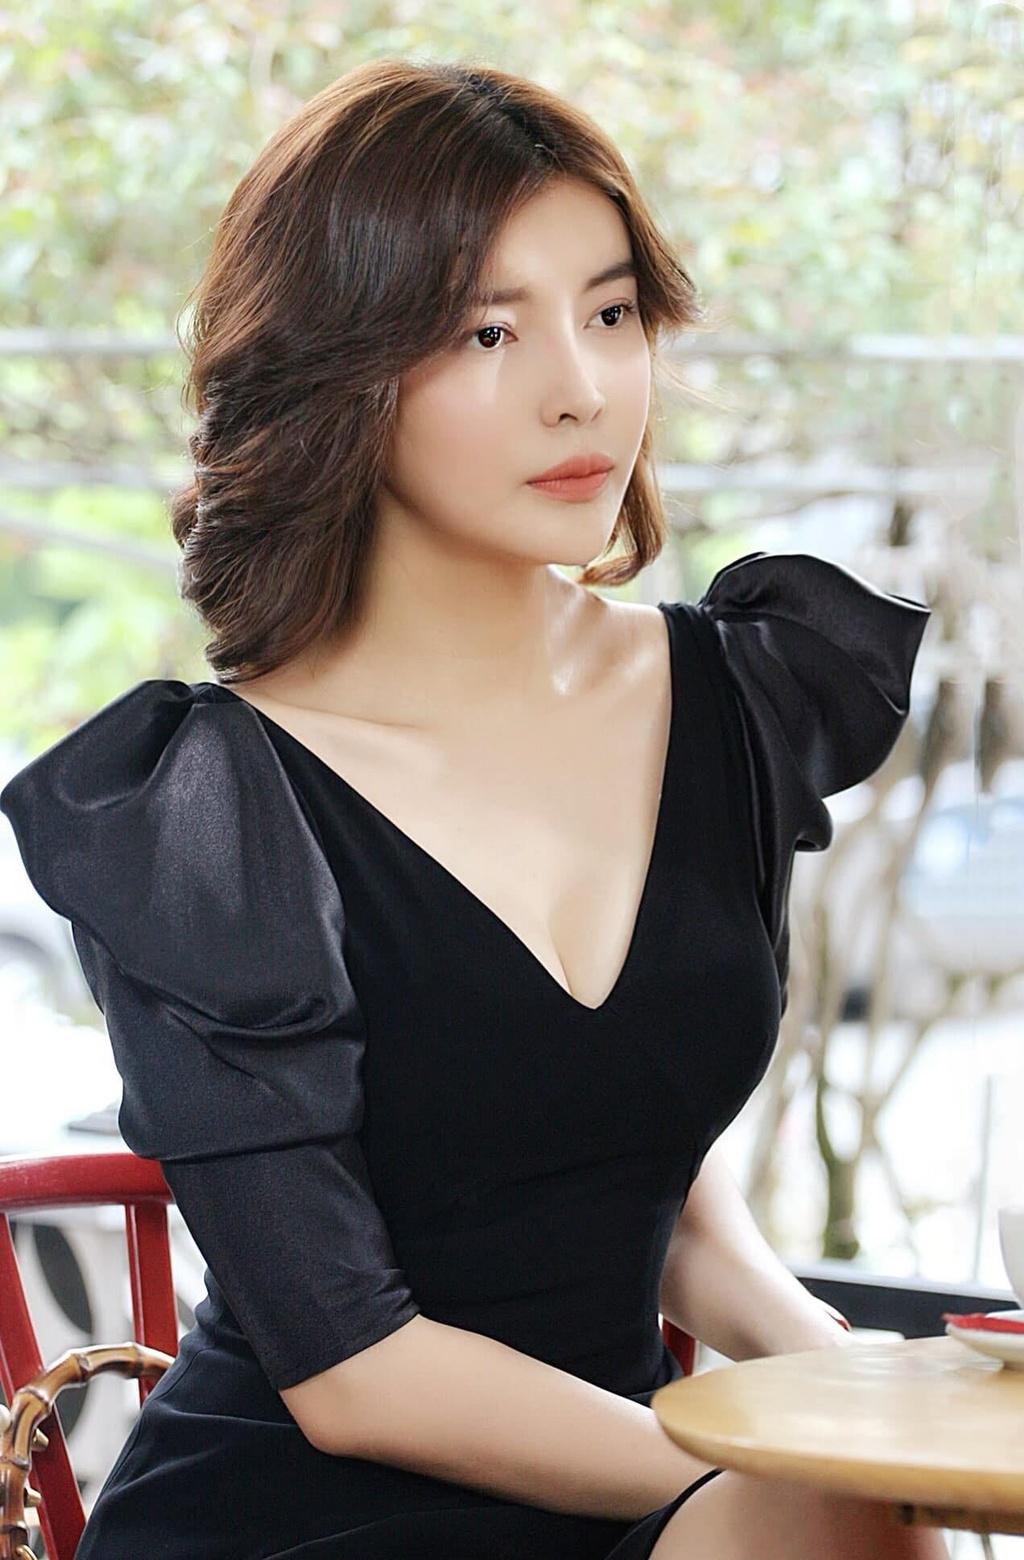 Cao Thai Ha canh nong Hua Minh Dat anh 4